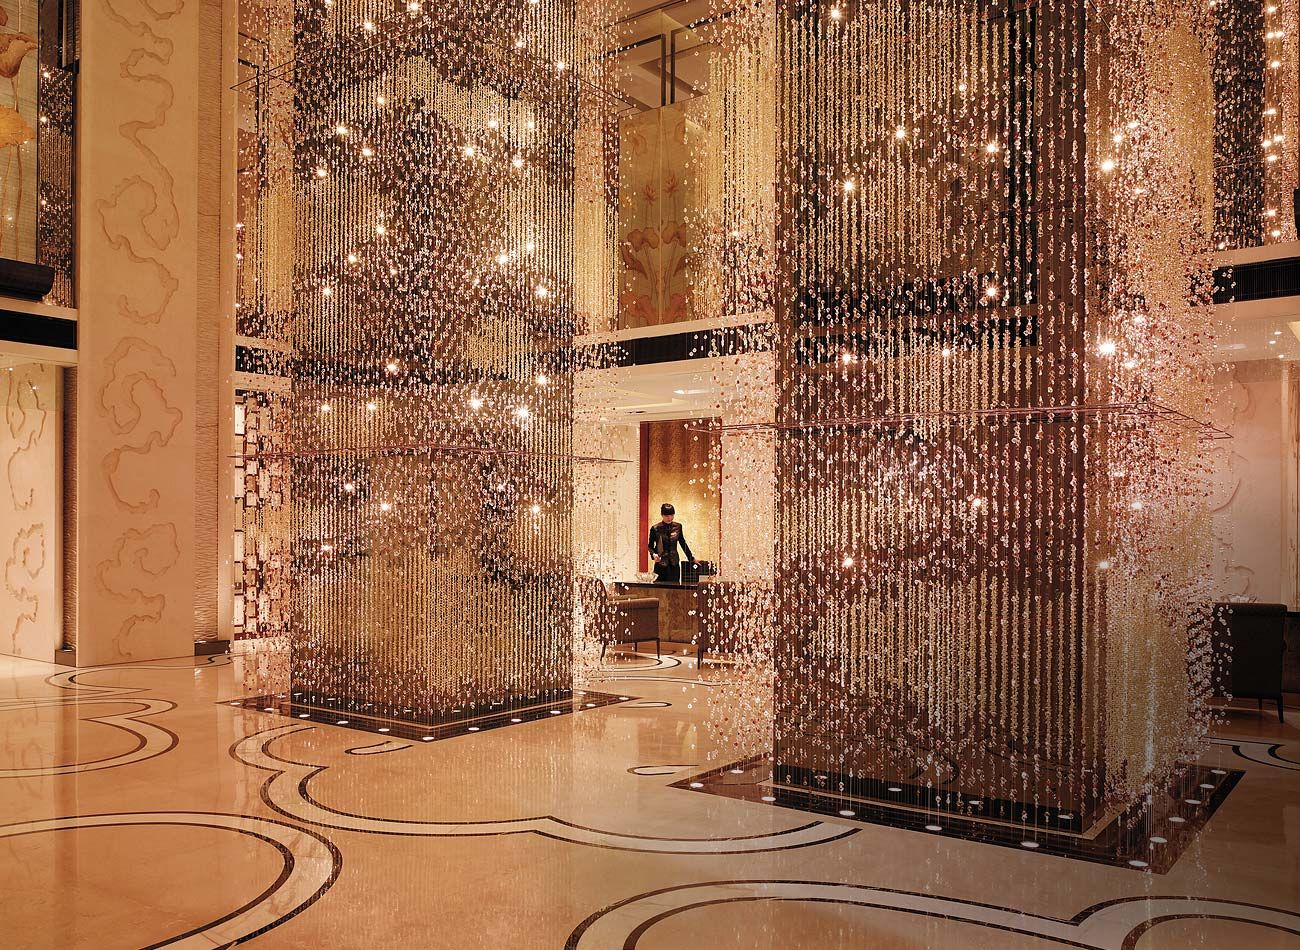 Shangri La Hotel Beijing China a stunning